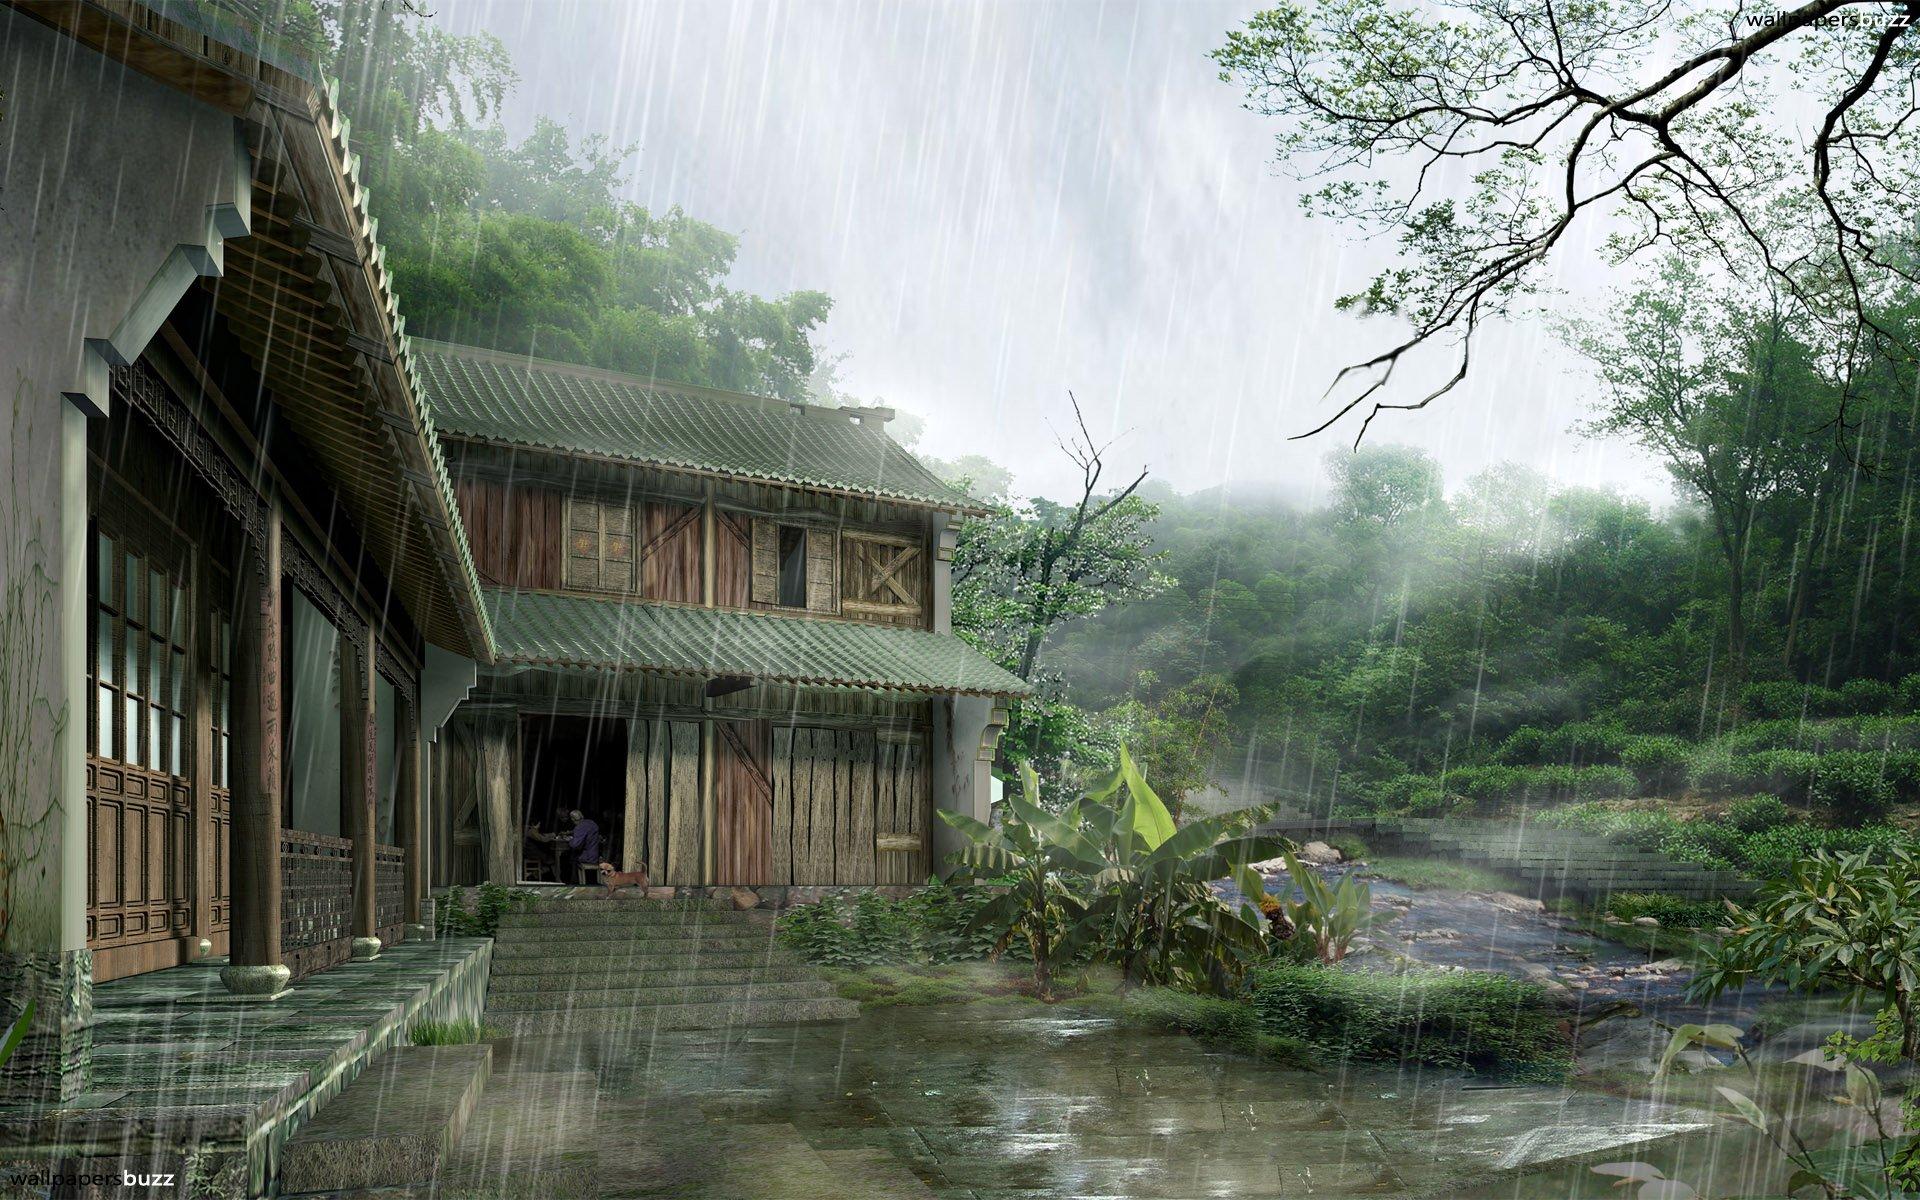 Rainy Day Wallpaper Free Wallpapersafari